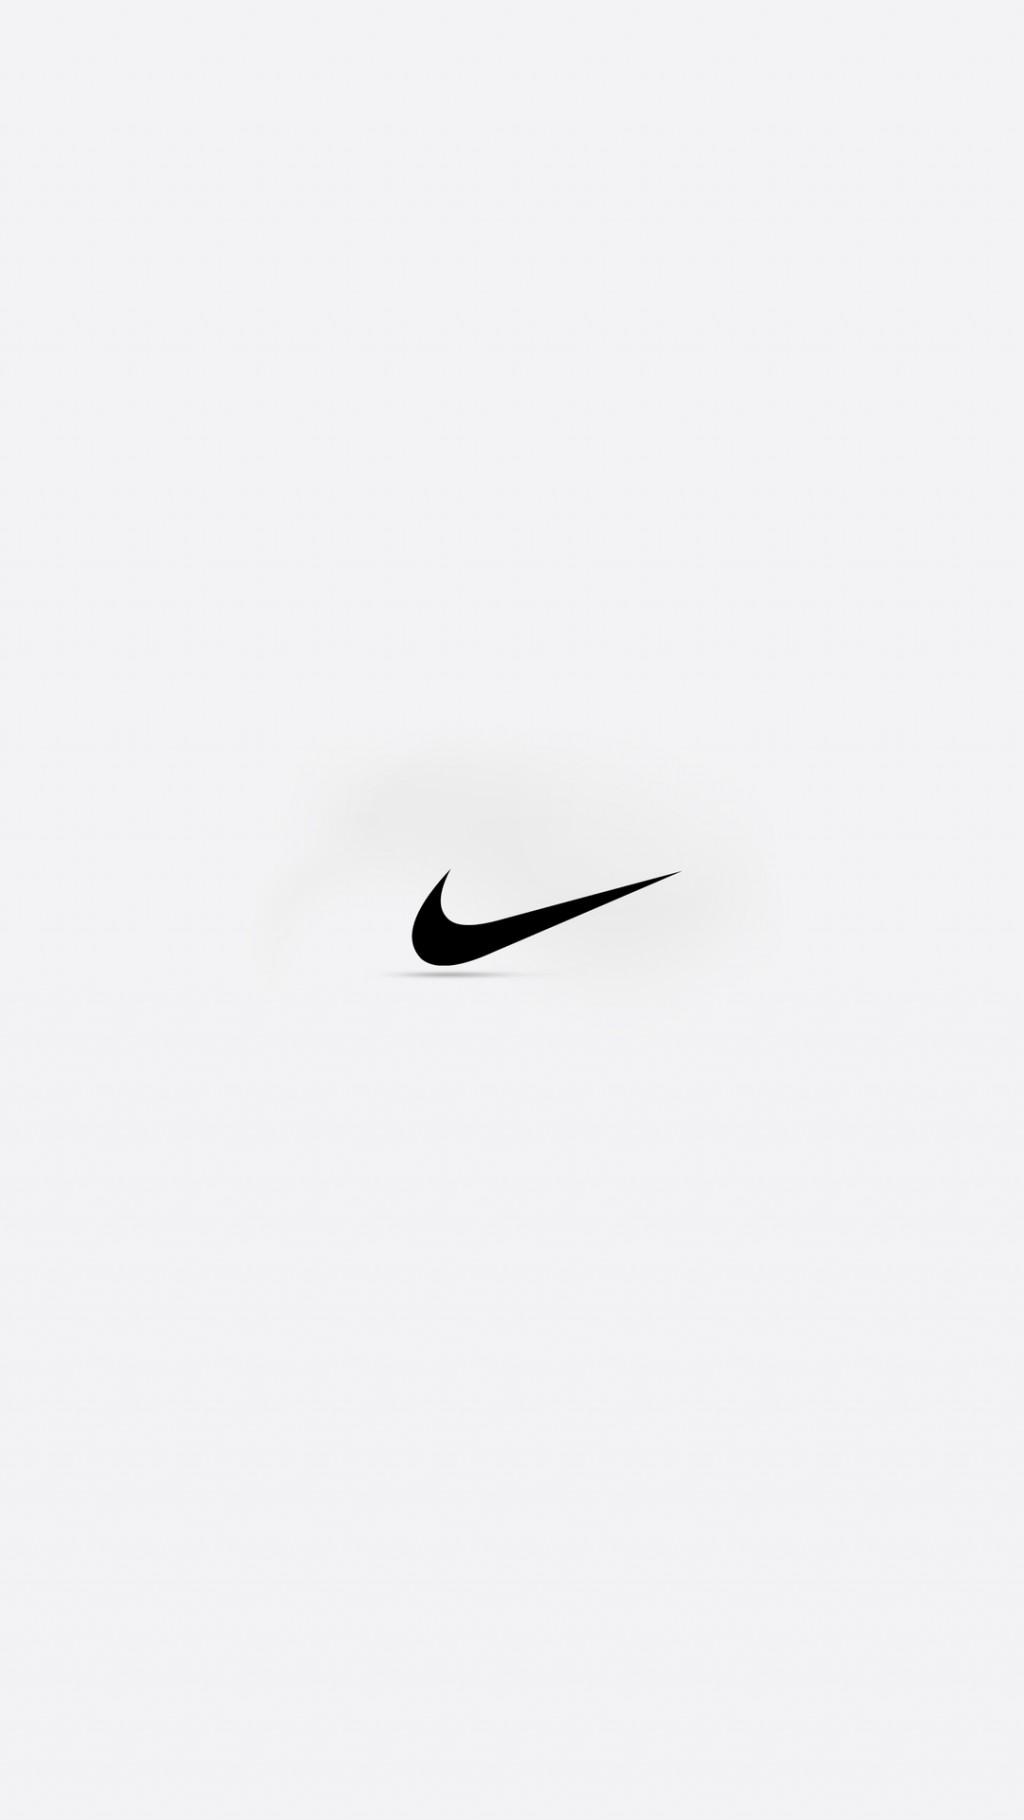 Logo Wallpaper Nike photos of Nike iPhone Wallpaper Here we have 1024x1820